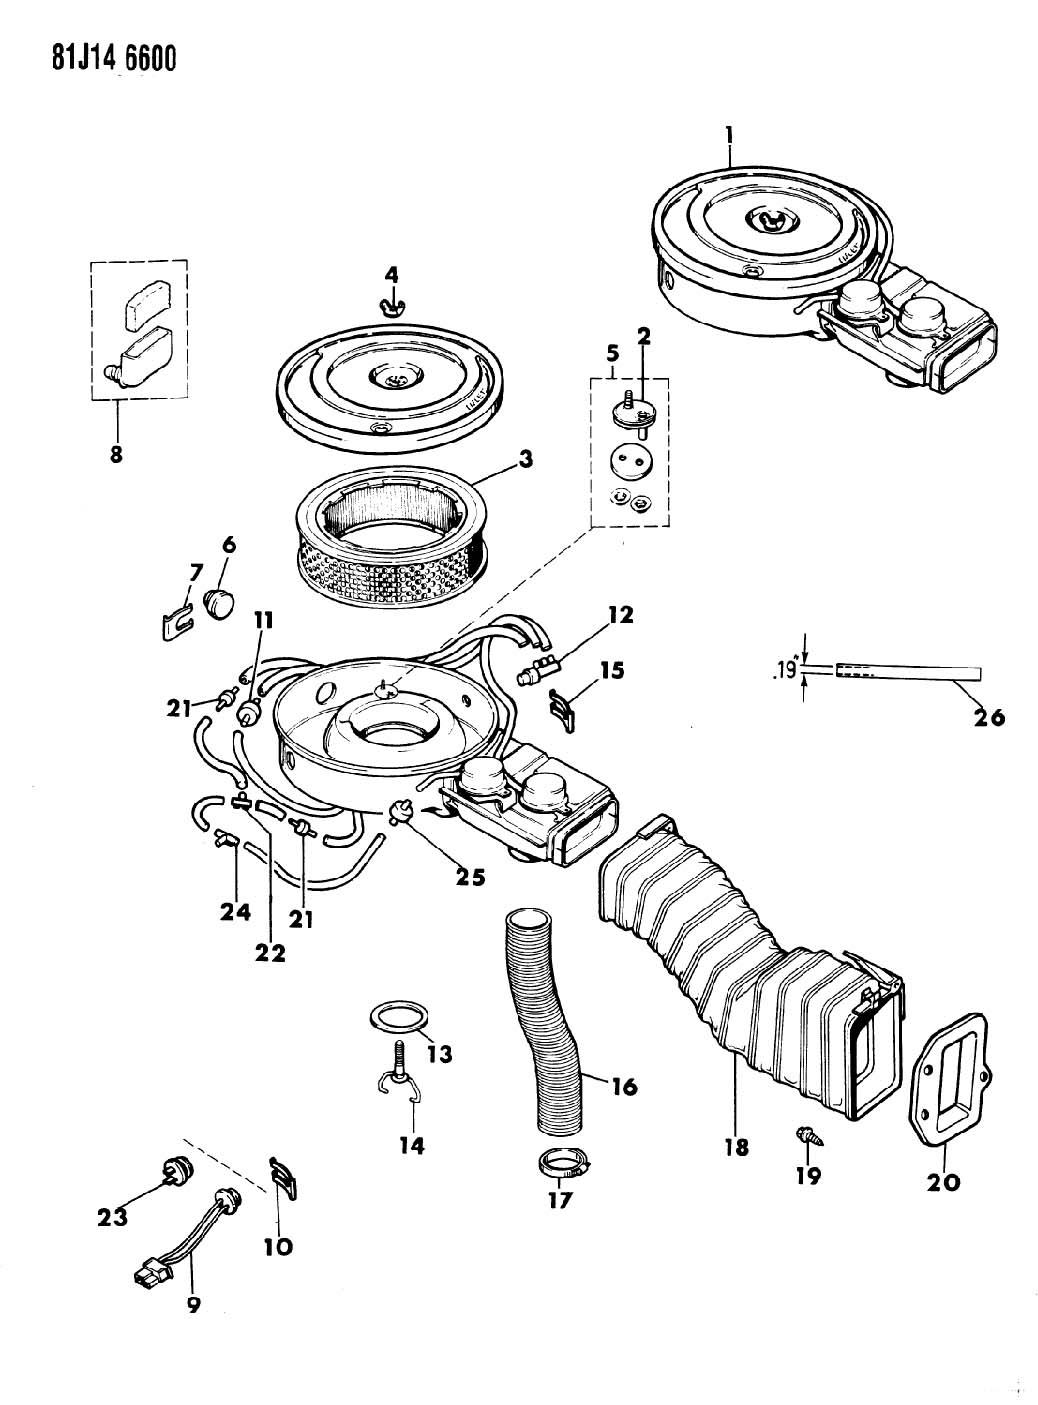 Diagram Download Jeep J10 Wiring Diagrams Hd Version